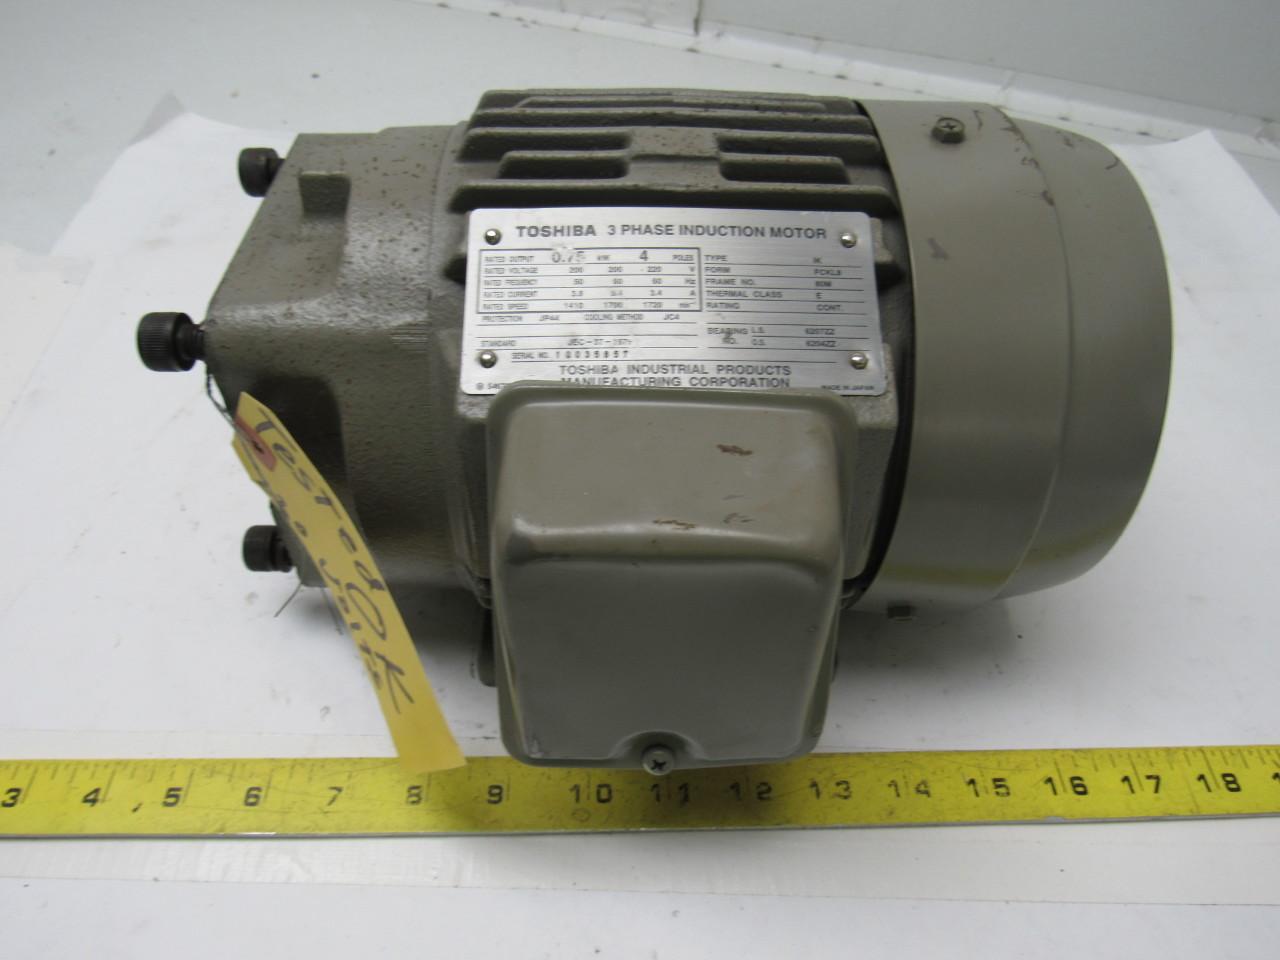 Toshiba Electric Induction Motor 200 220v 3ph 1720